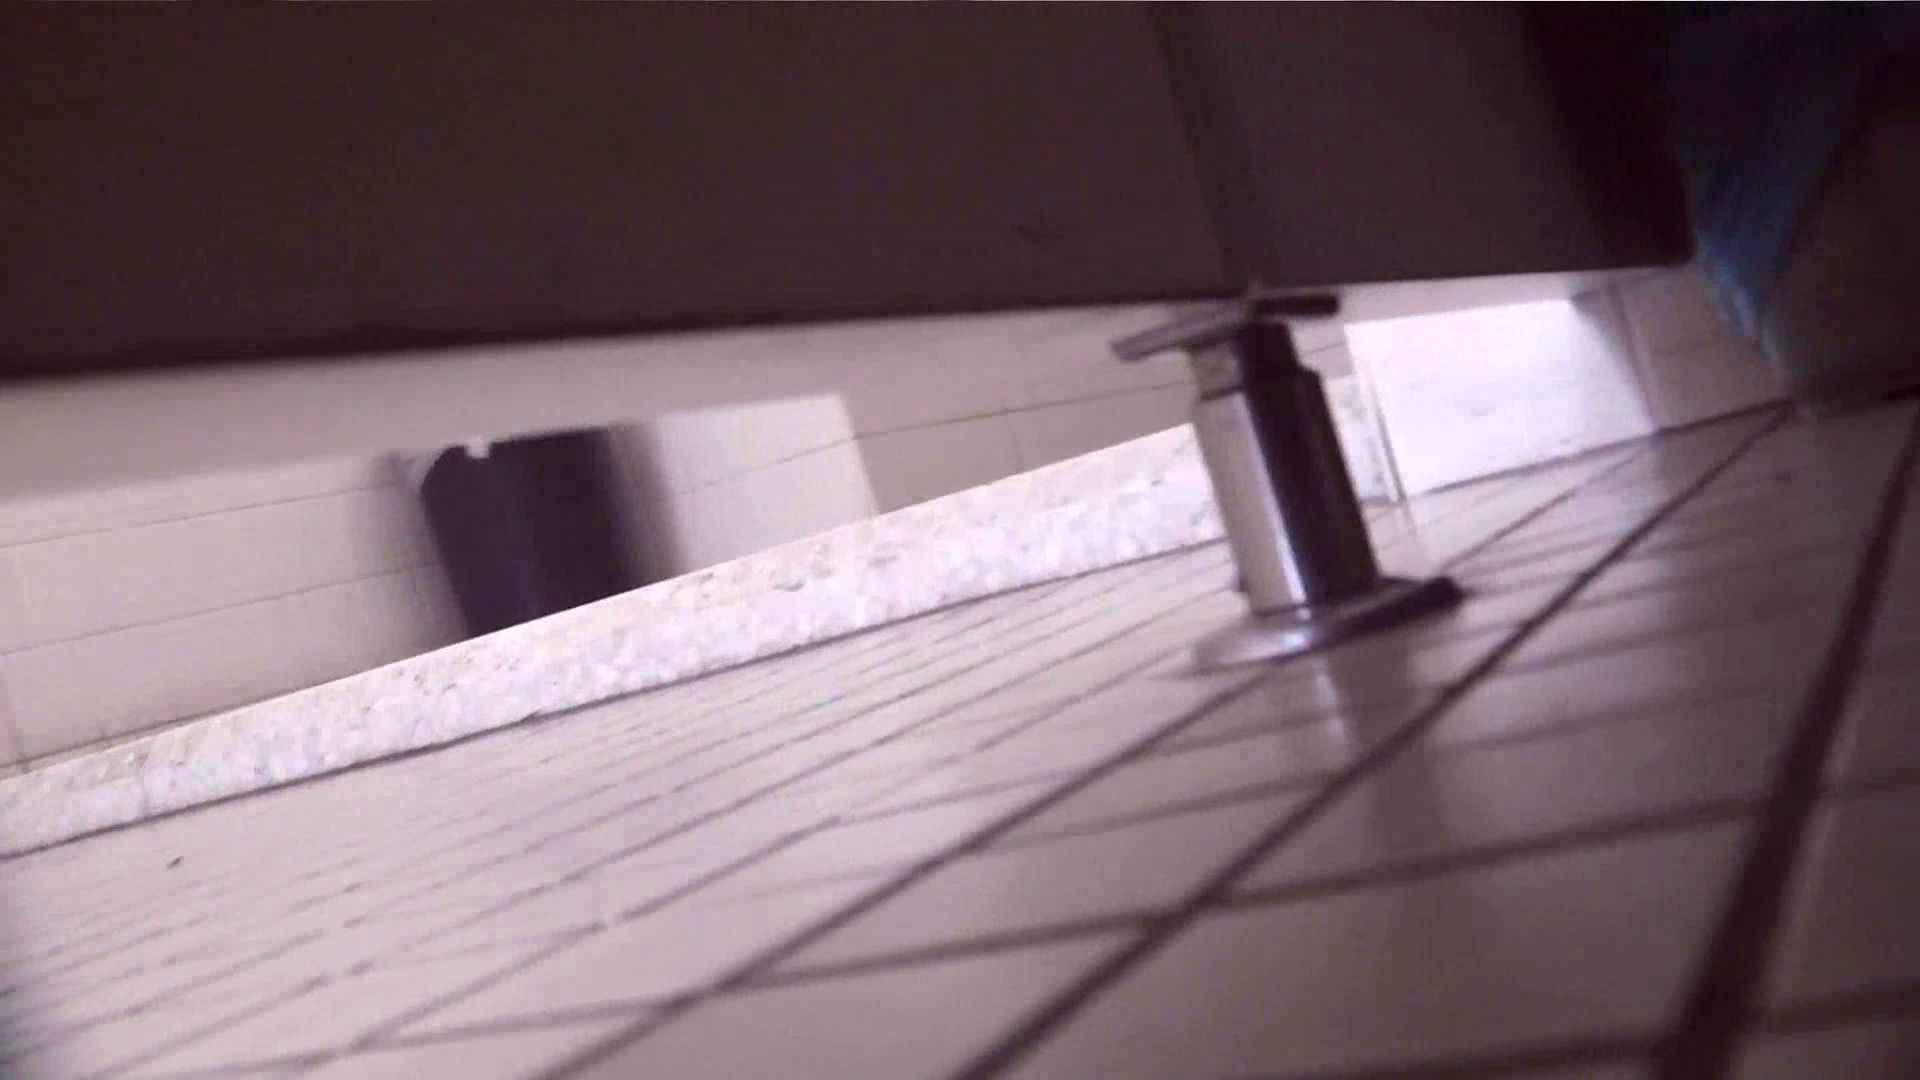 vol.17 命がけ潜伏洗面所! 張り裂けんばかりの大物 プライベート ワレメ無修正動画無料 88pic 11